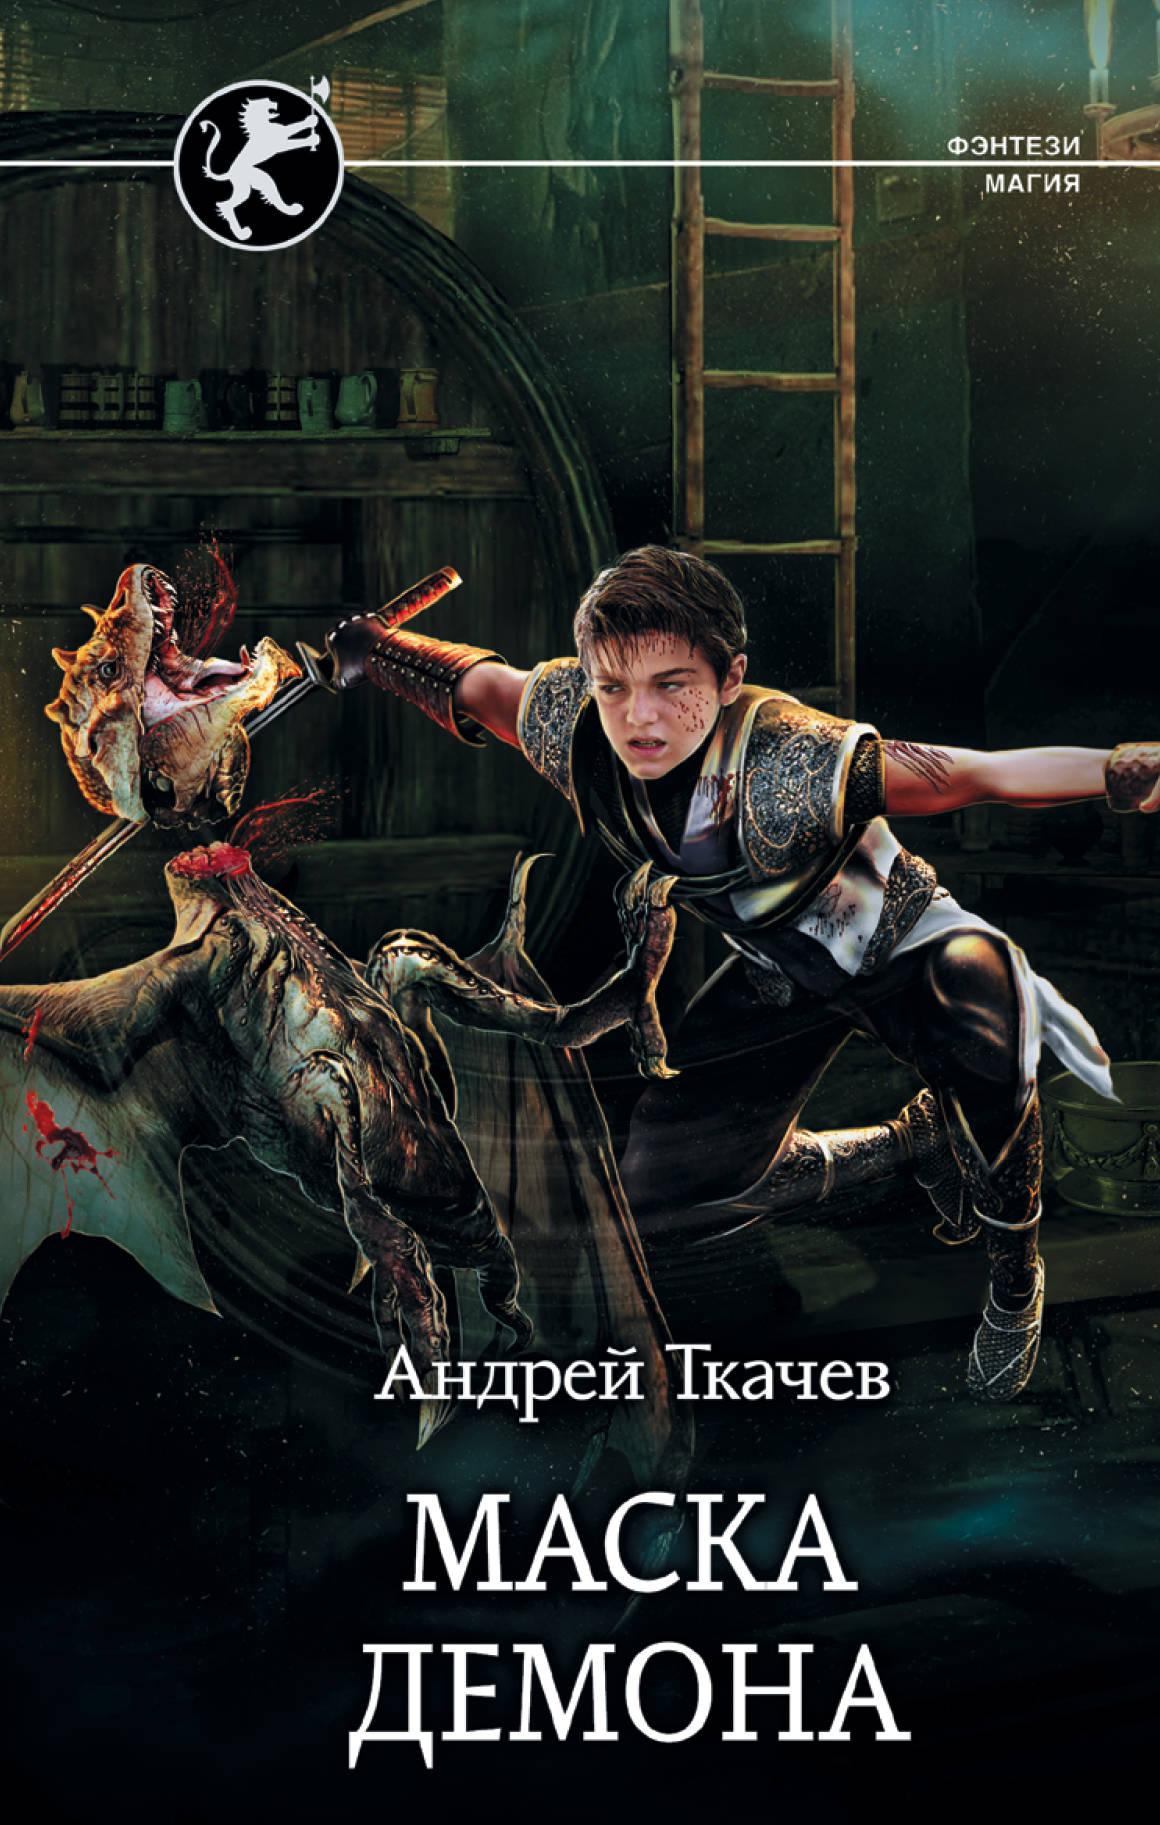 Андрей Ткачев «Маска демона»